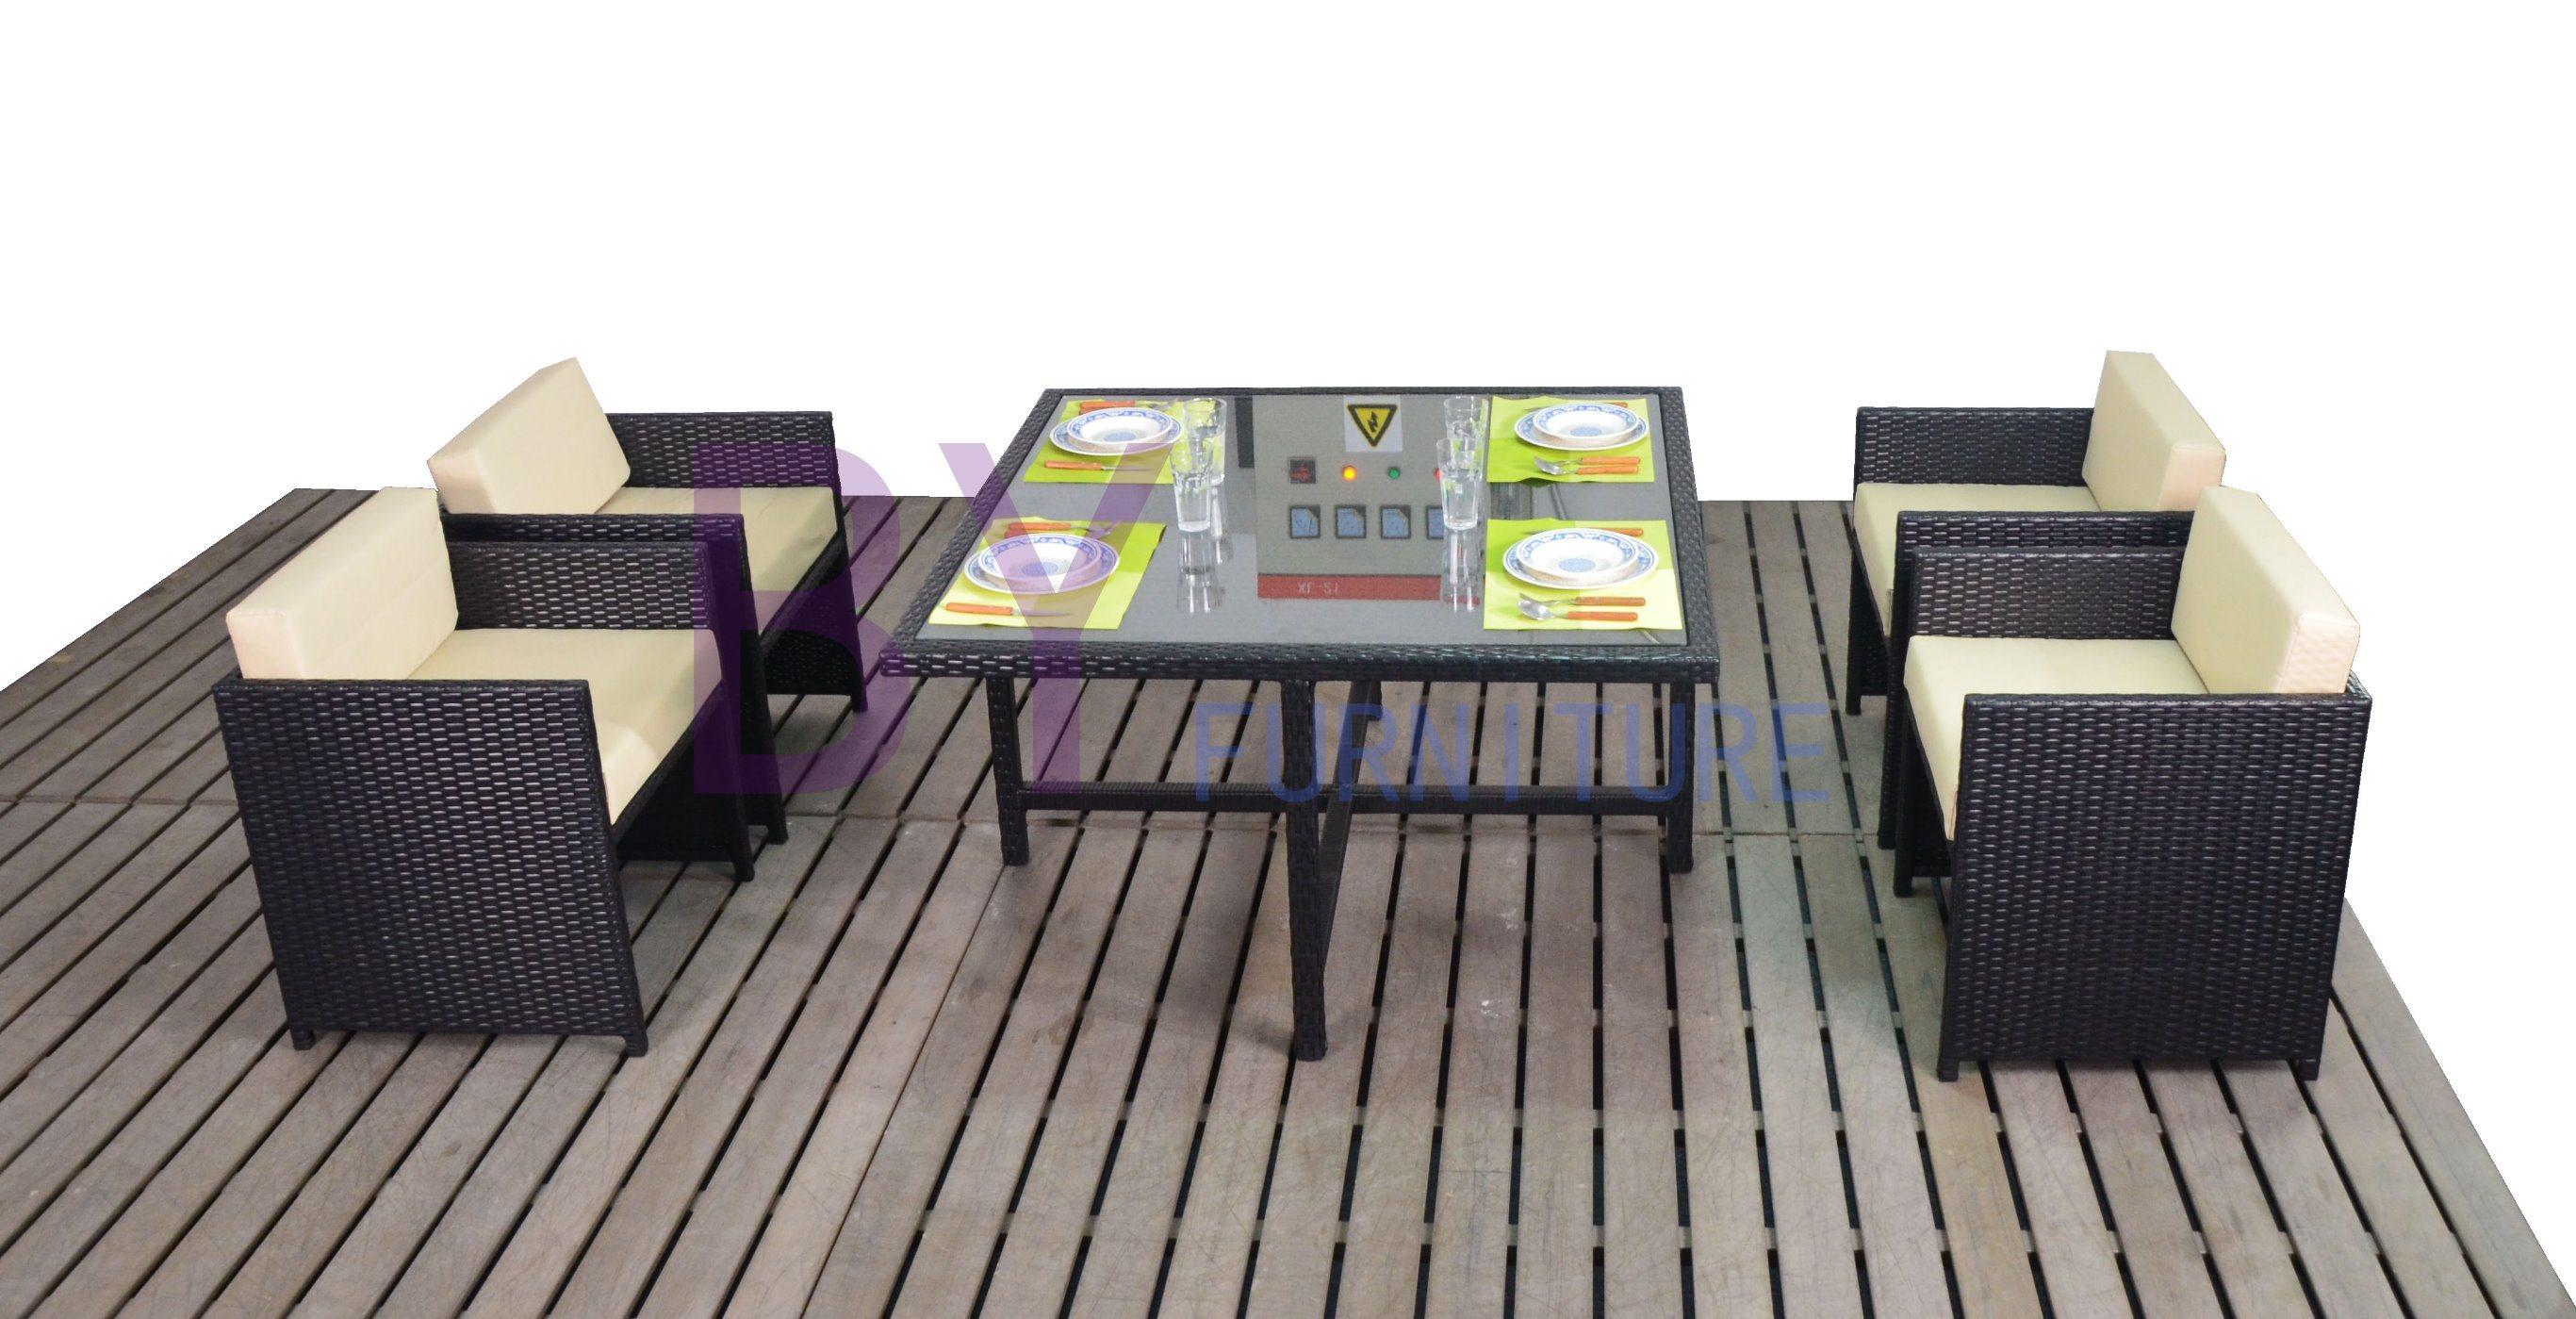 Outdoor Courtyard Garden Leisure Hotel Coffee Bar Dining Furniture with PE Rattan